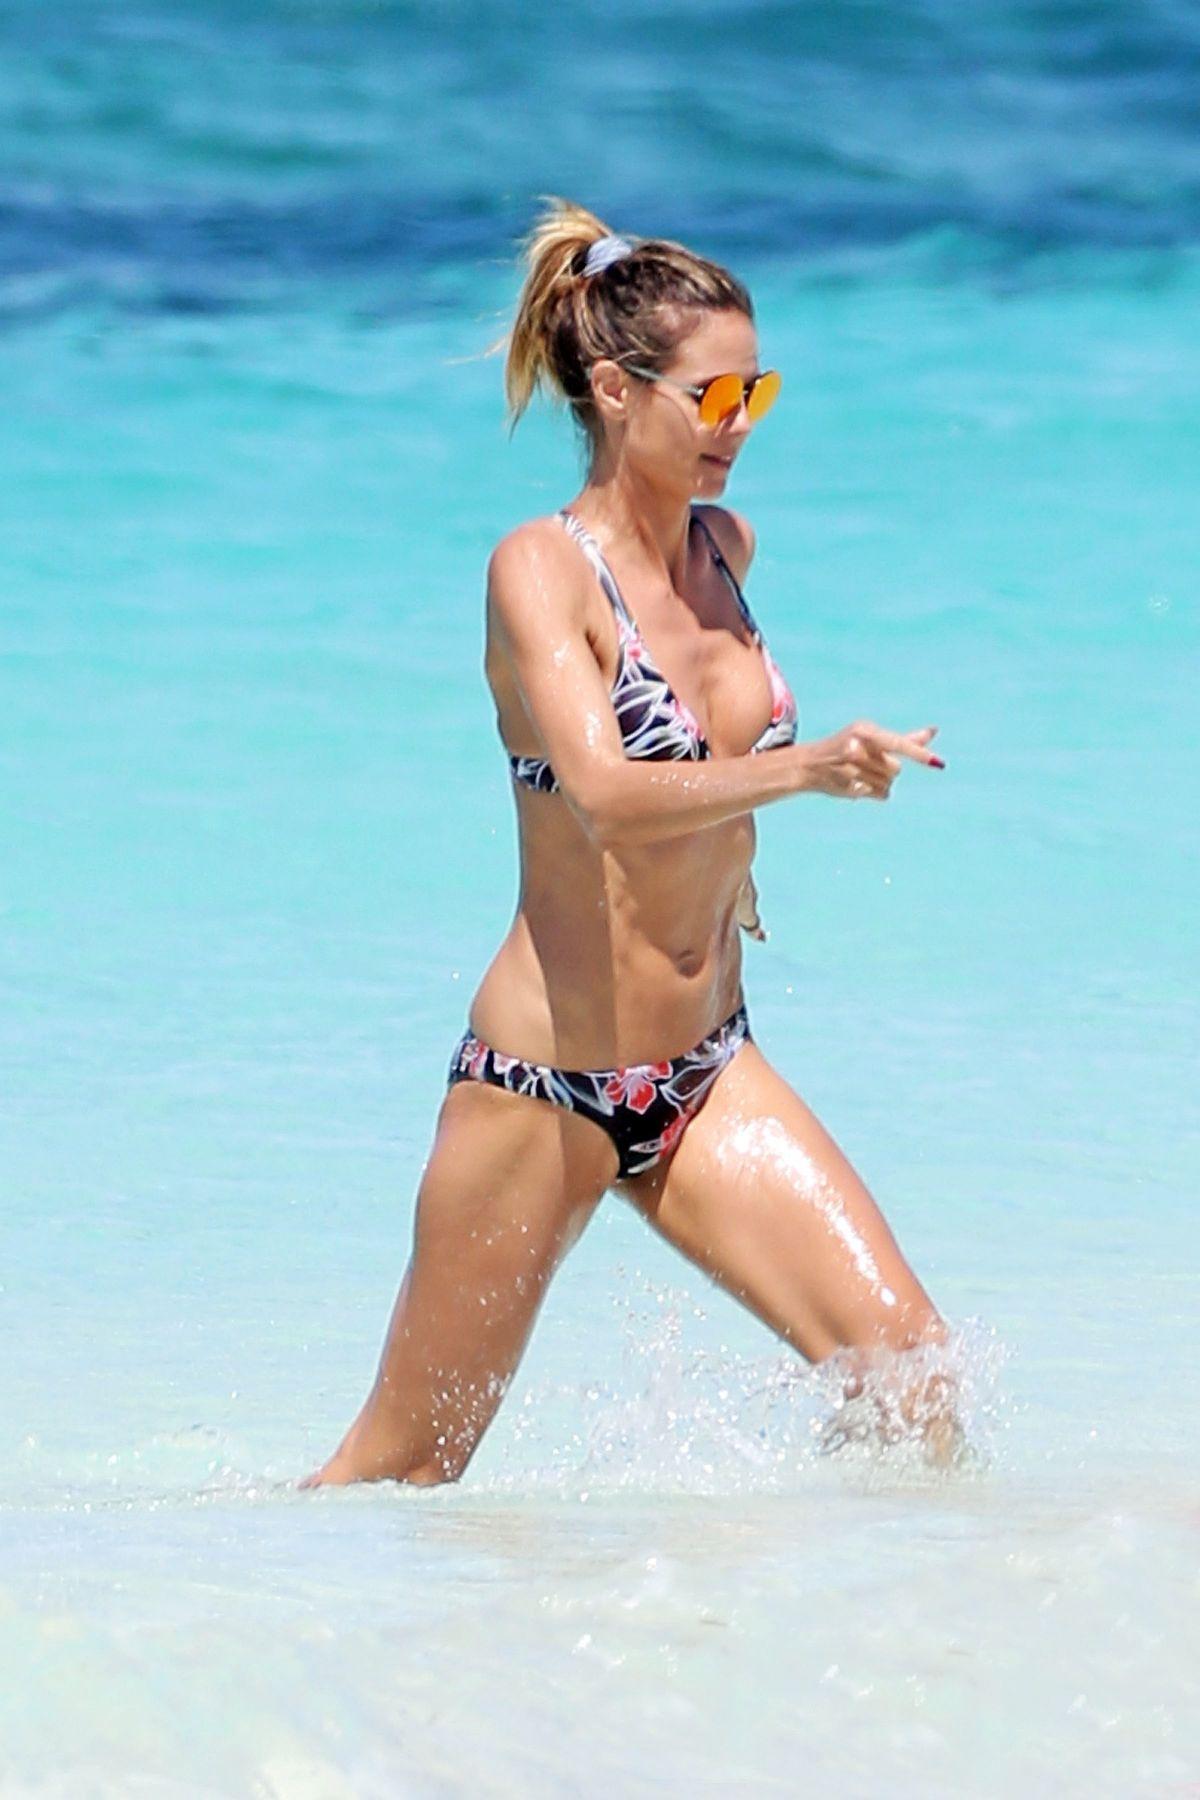 Bikini Heidi Klum nude (38 photo), Topless, Leaked, Twitter, swimsuit 2017